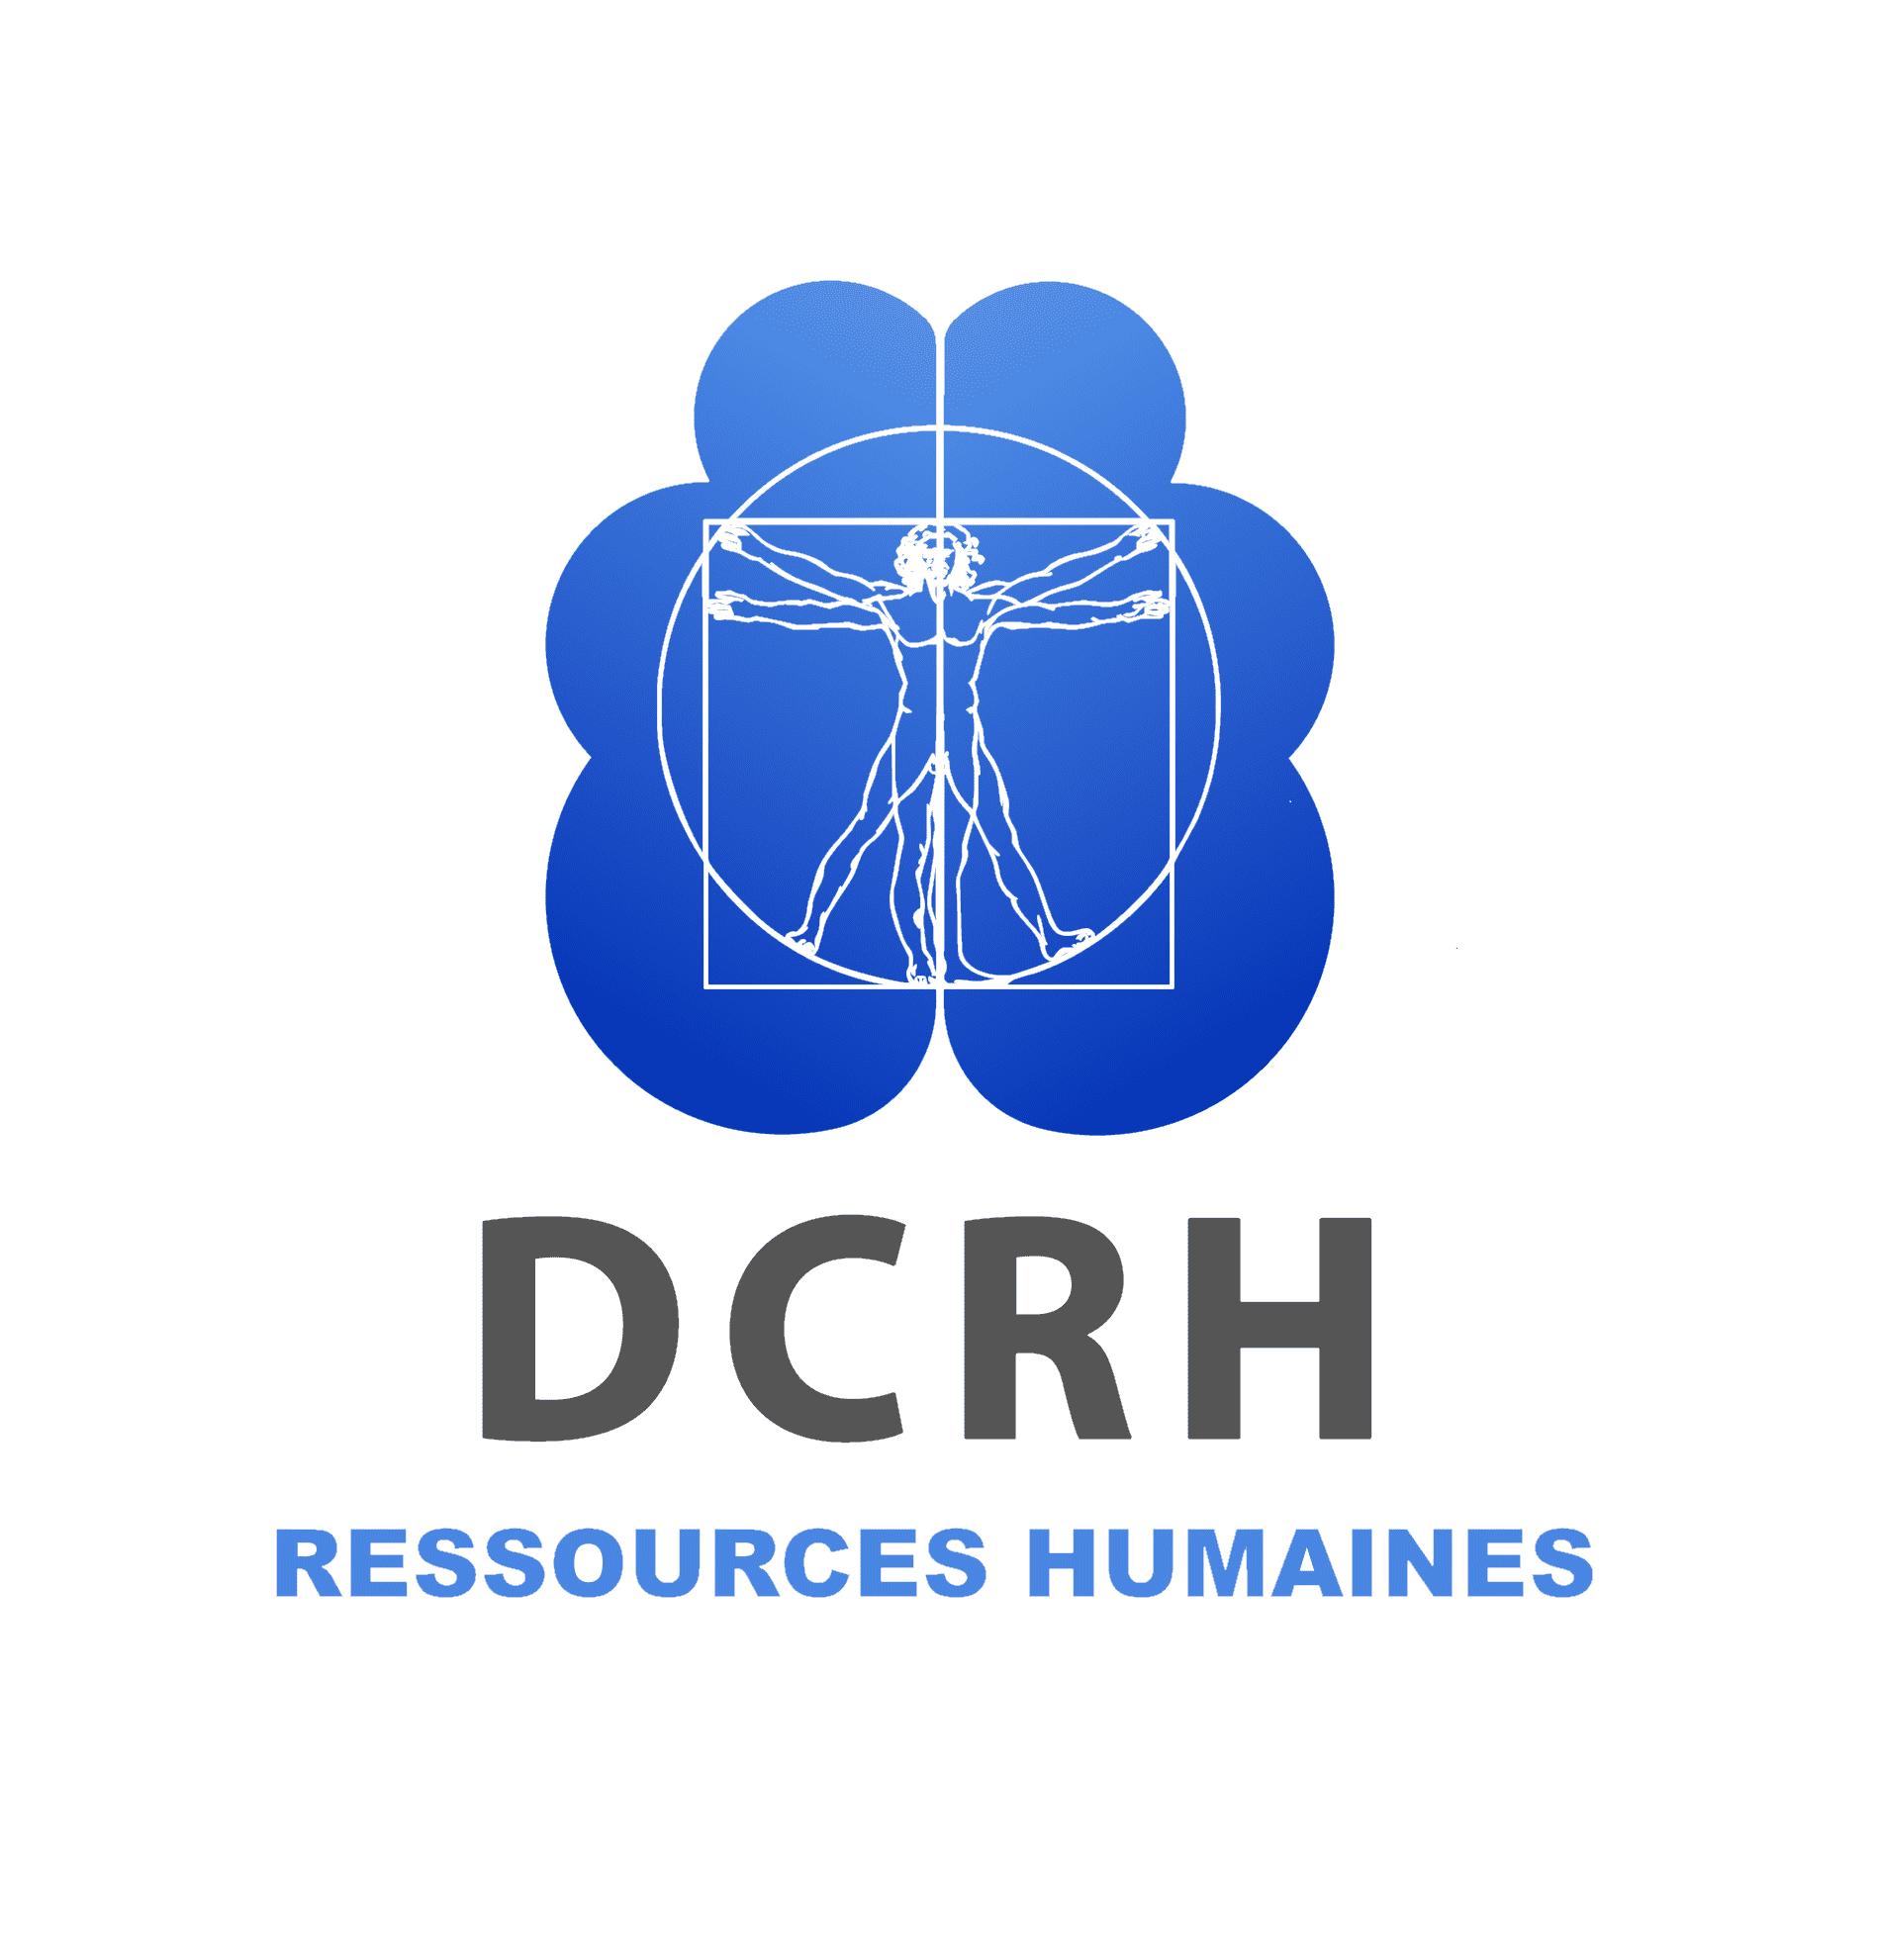 Centre DCRH - Béthune (62)